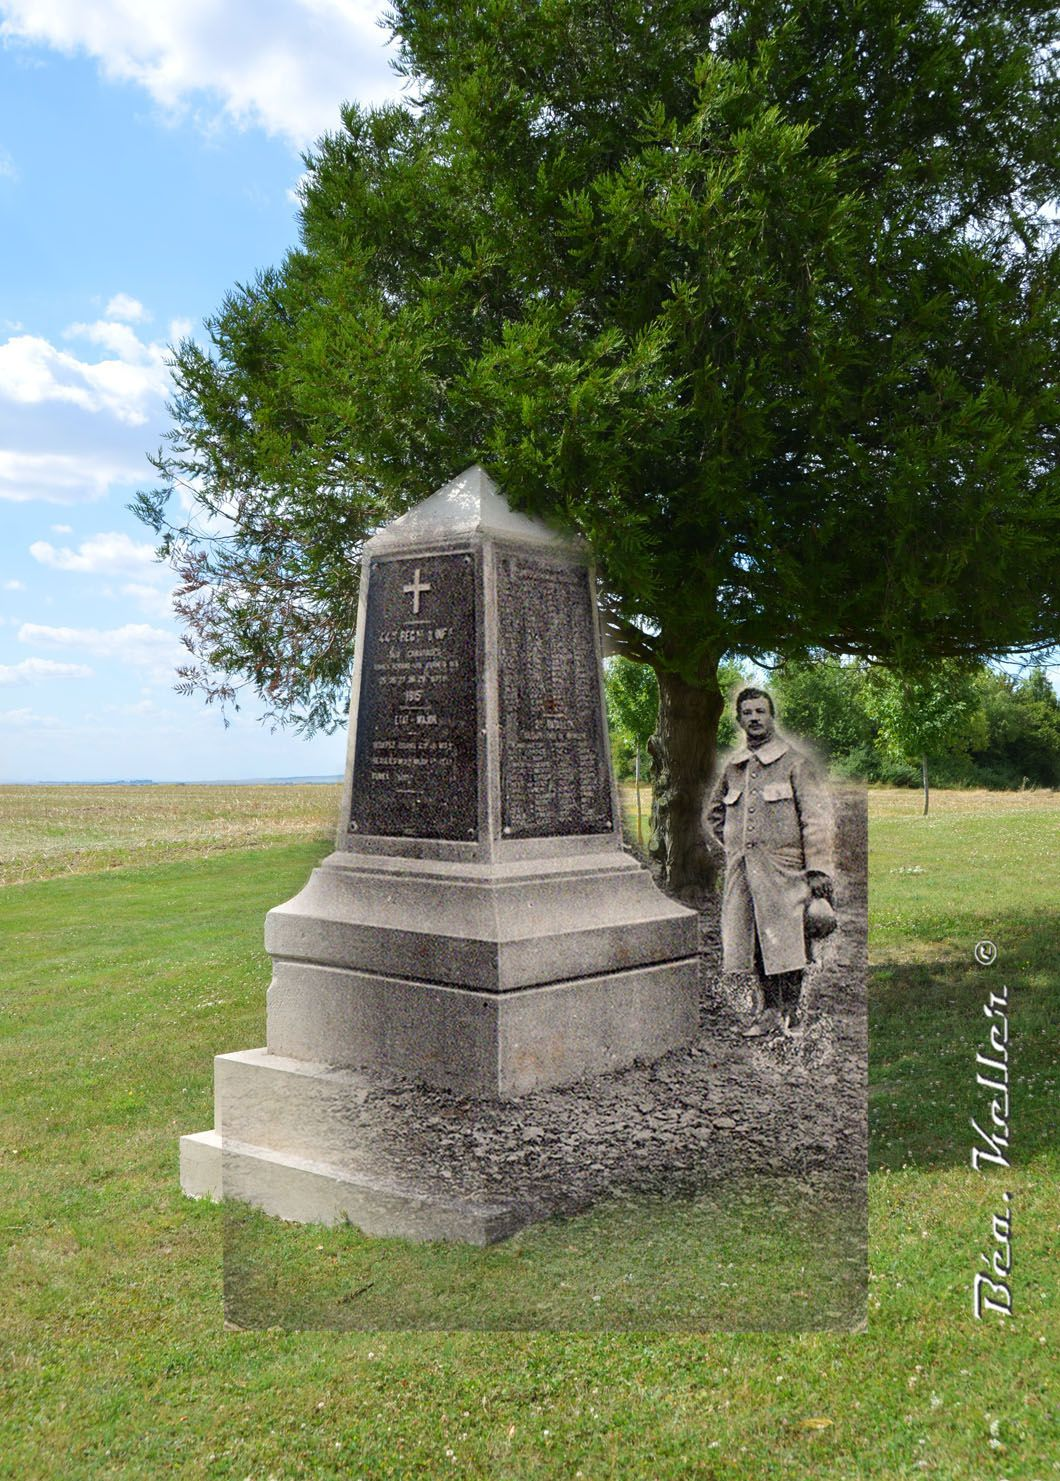 Souain 28e Brigade-Ferme des Wacques - Monument au 44e R.I.